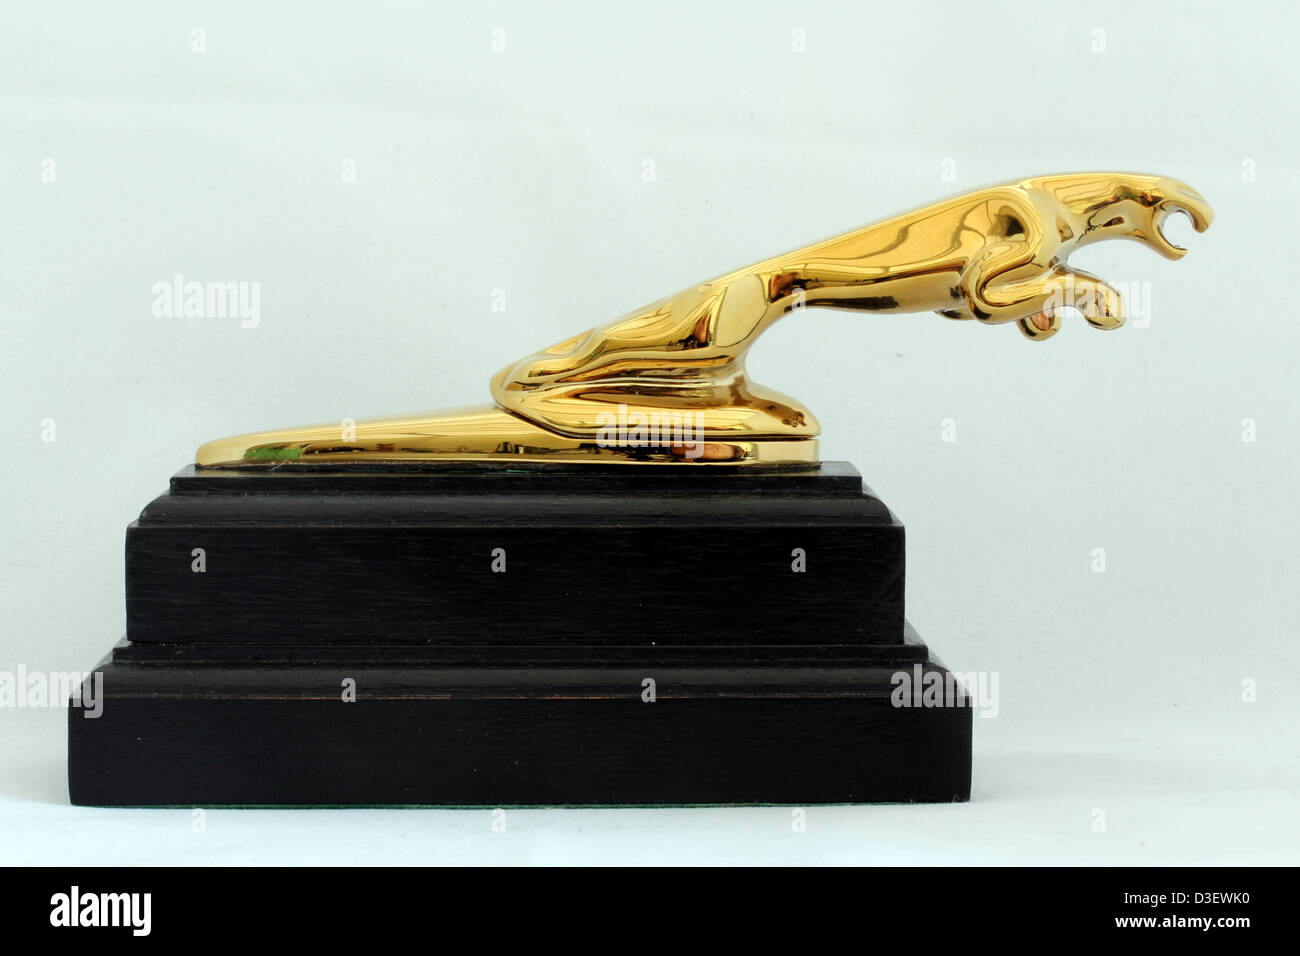 A gold leaping jaguar car bonnet mascot mounted on a plinth. - Stock Image